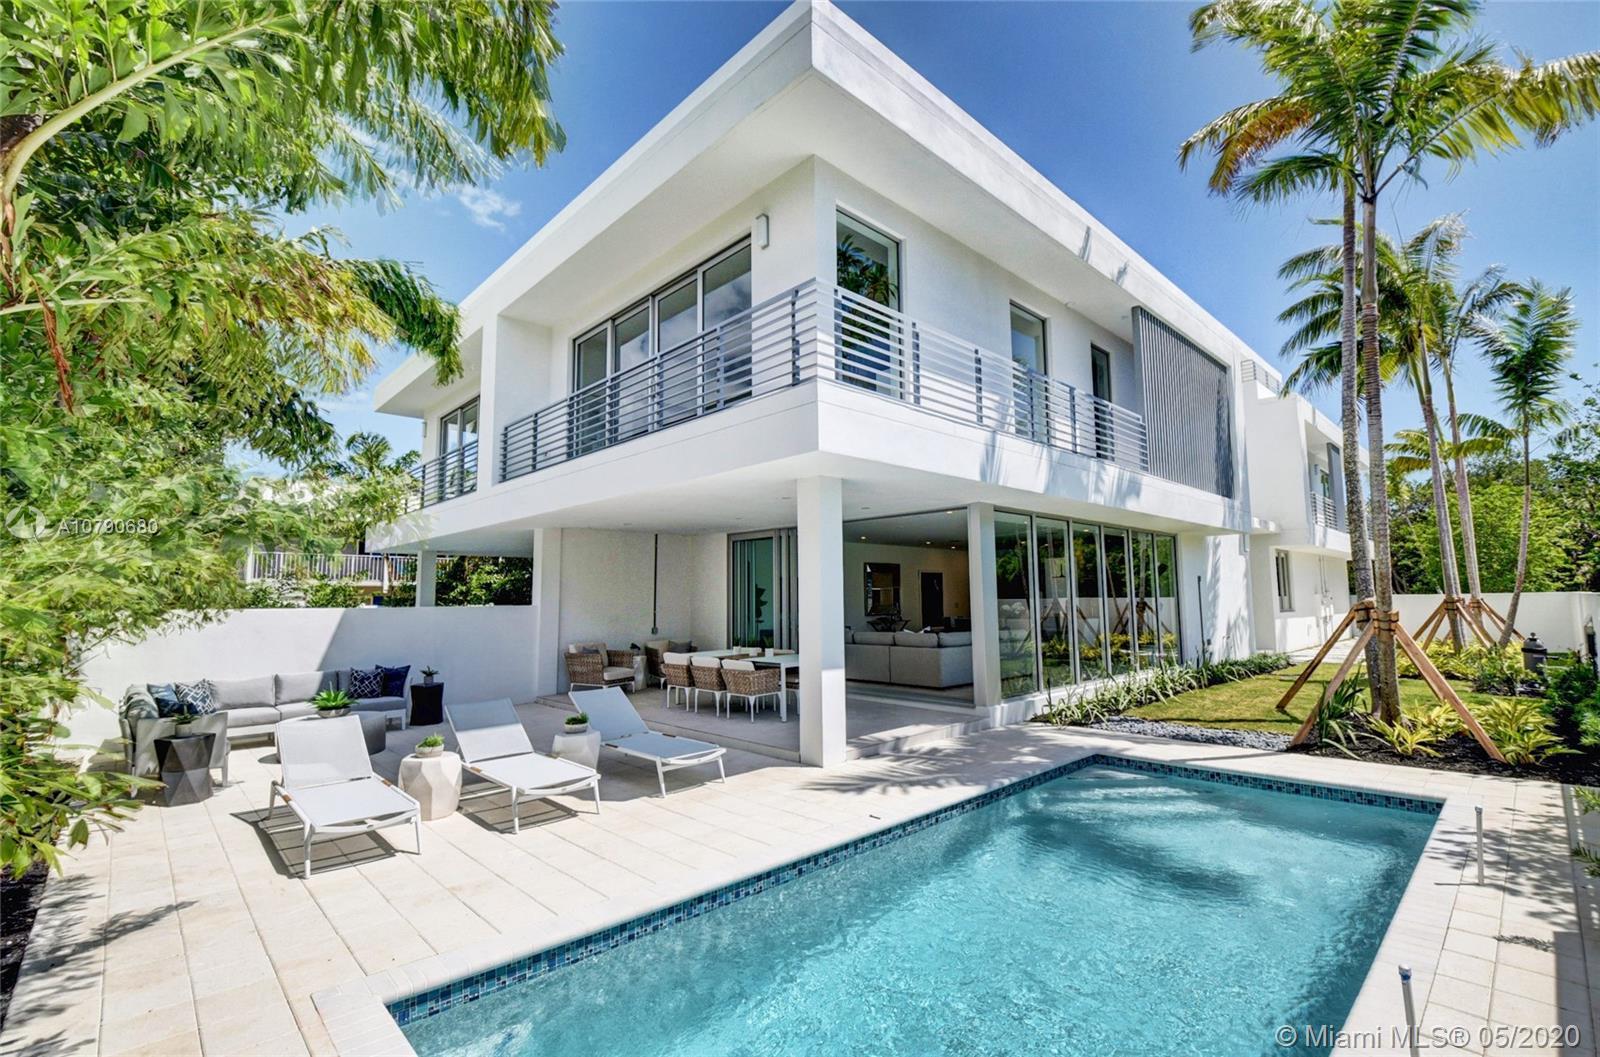 1200 palm trail B, Delray Beach, FL 33483